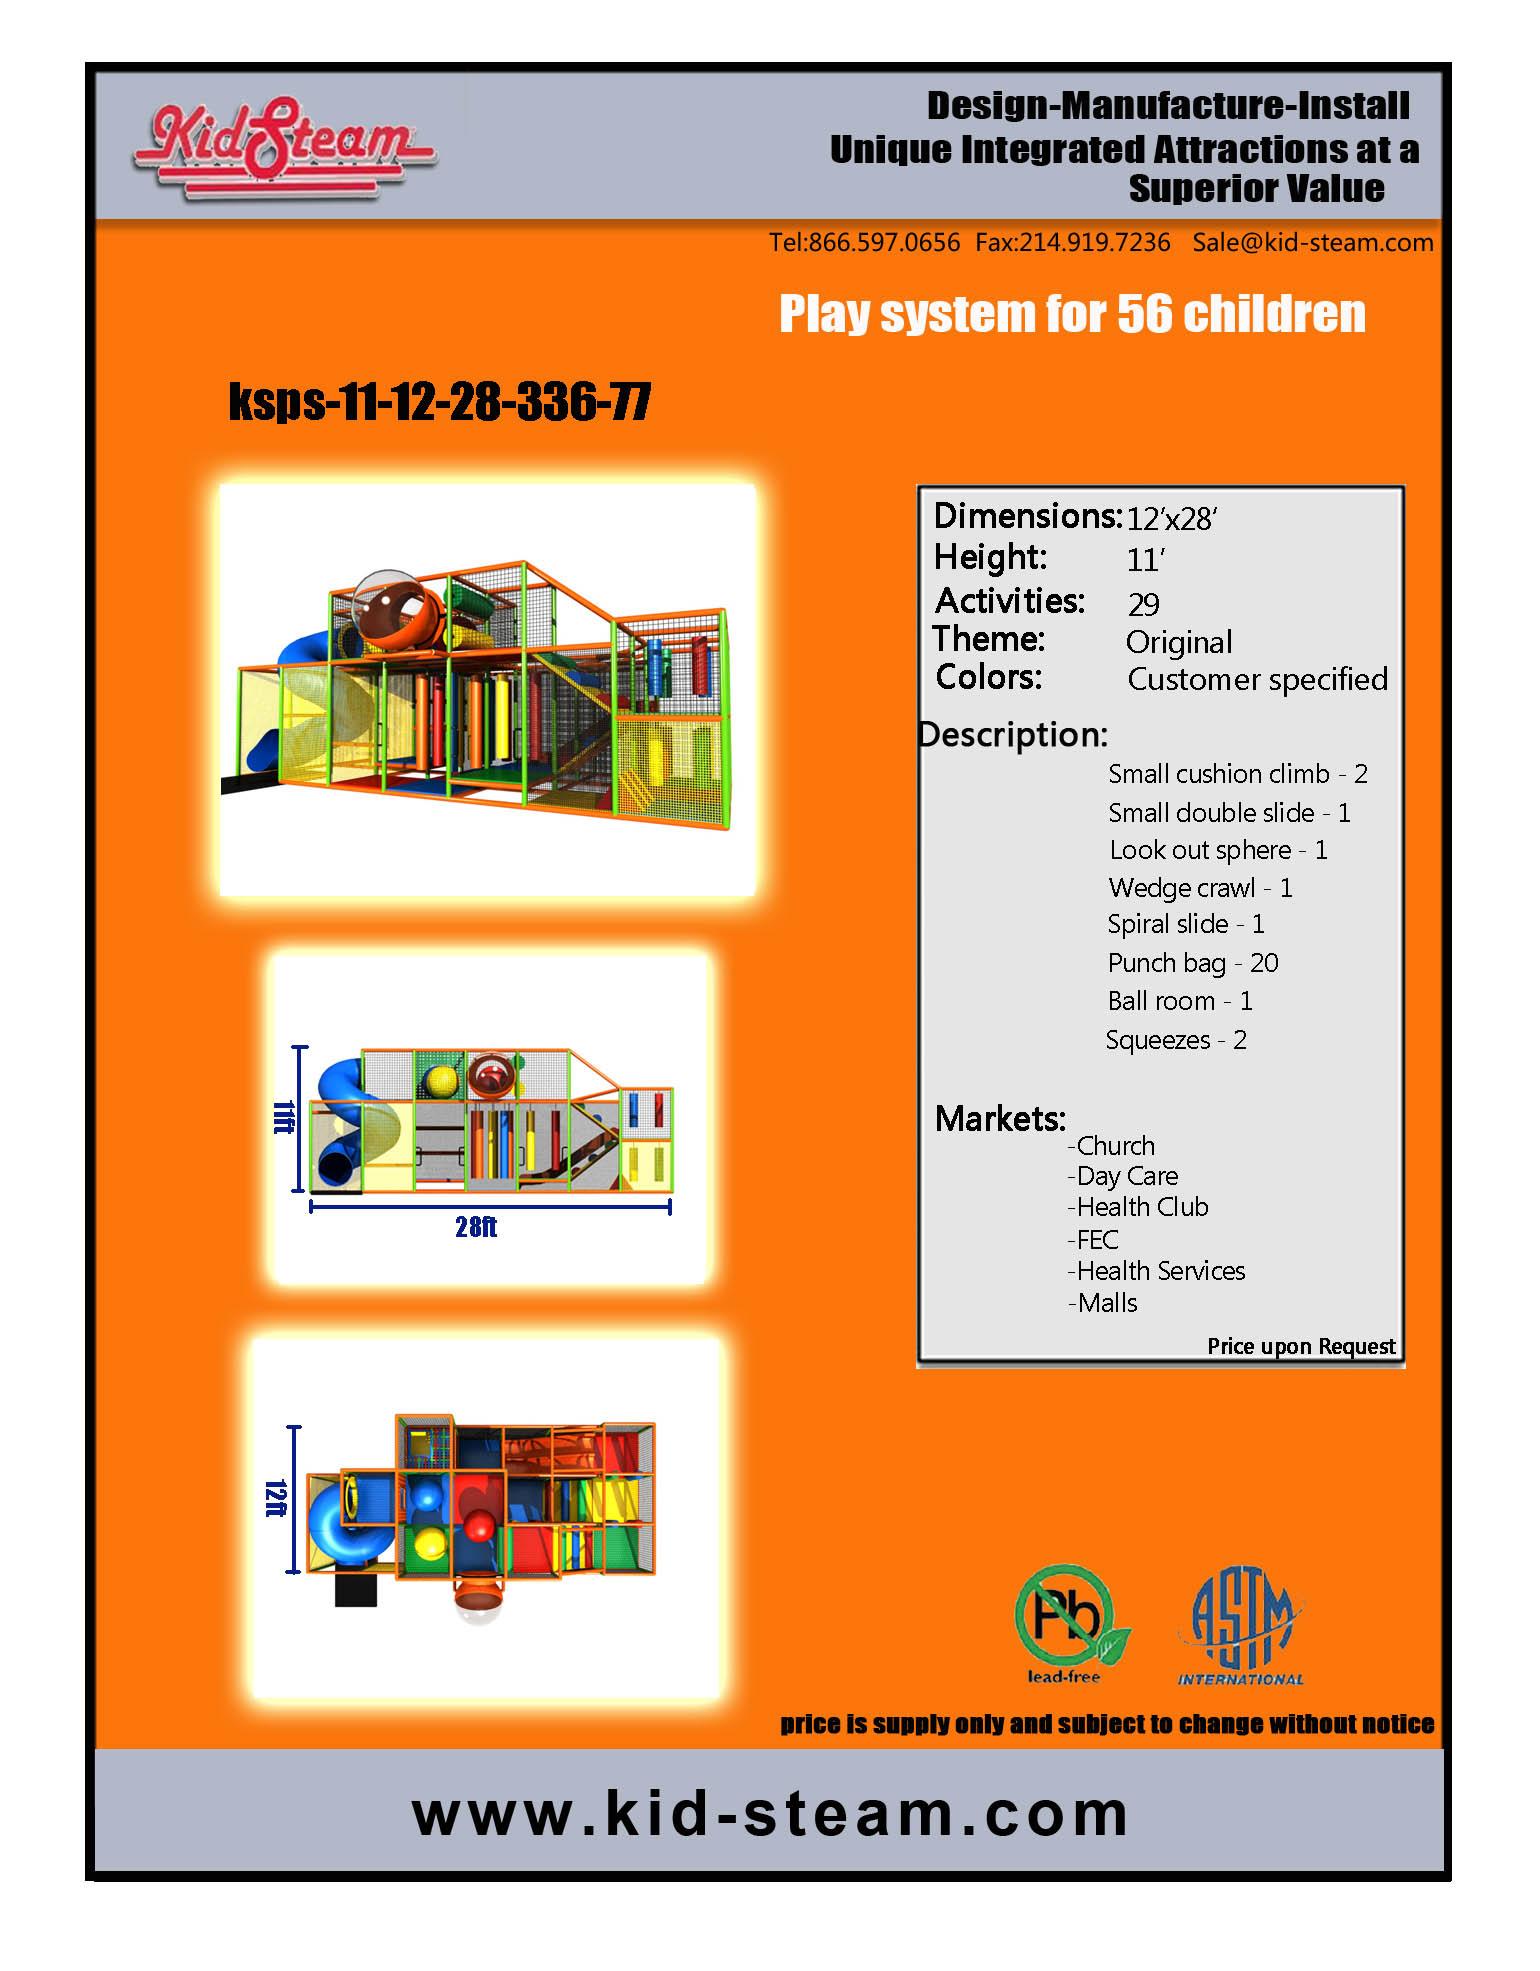 Indoor Playground Design: Budget: $26,000-$36,000 Ages: 3-12